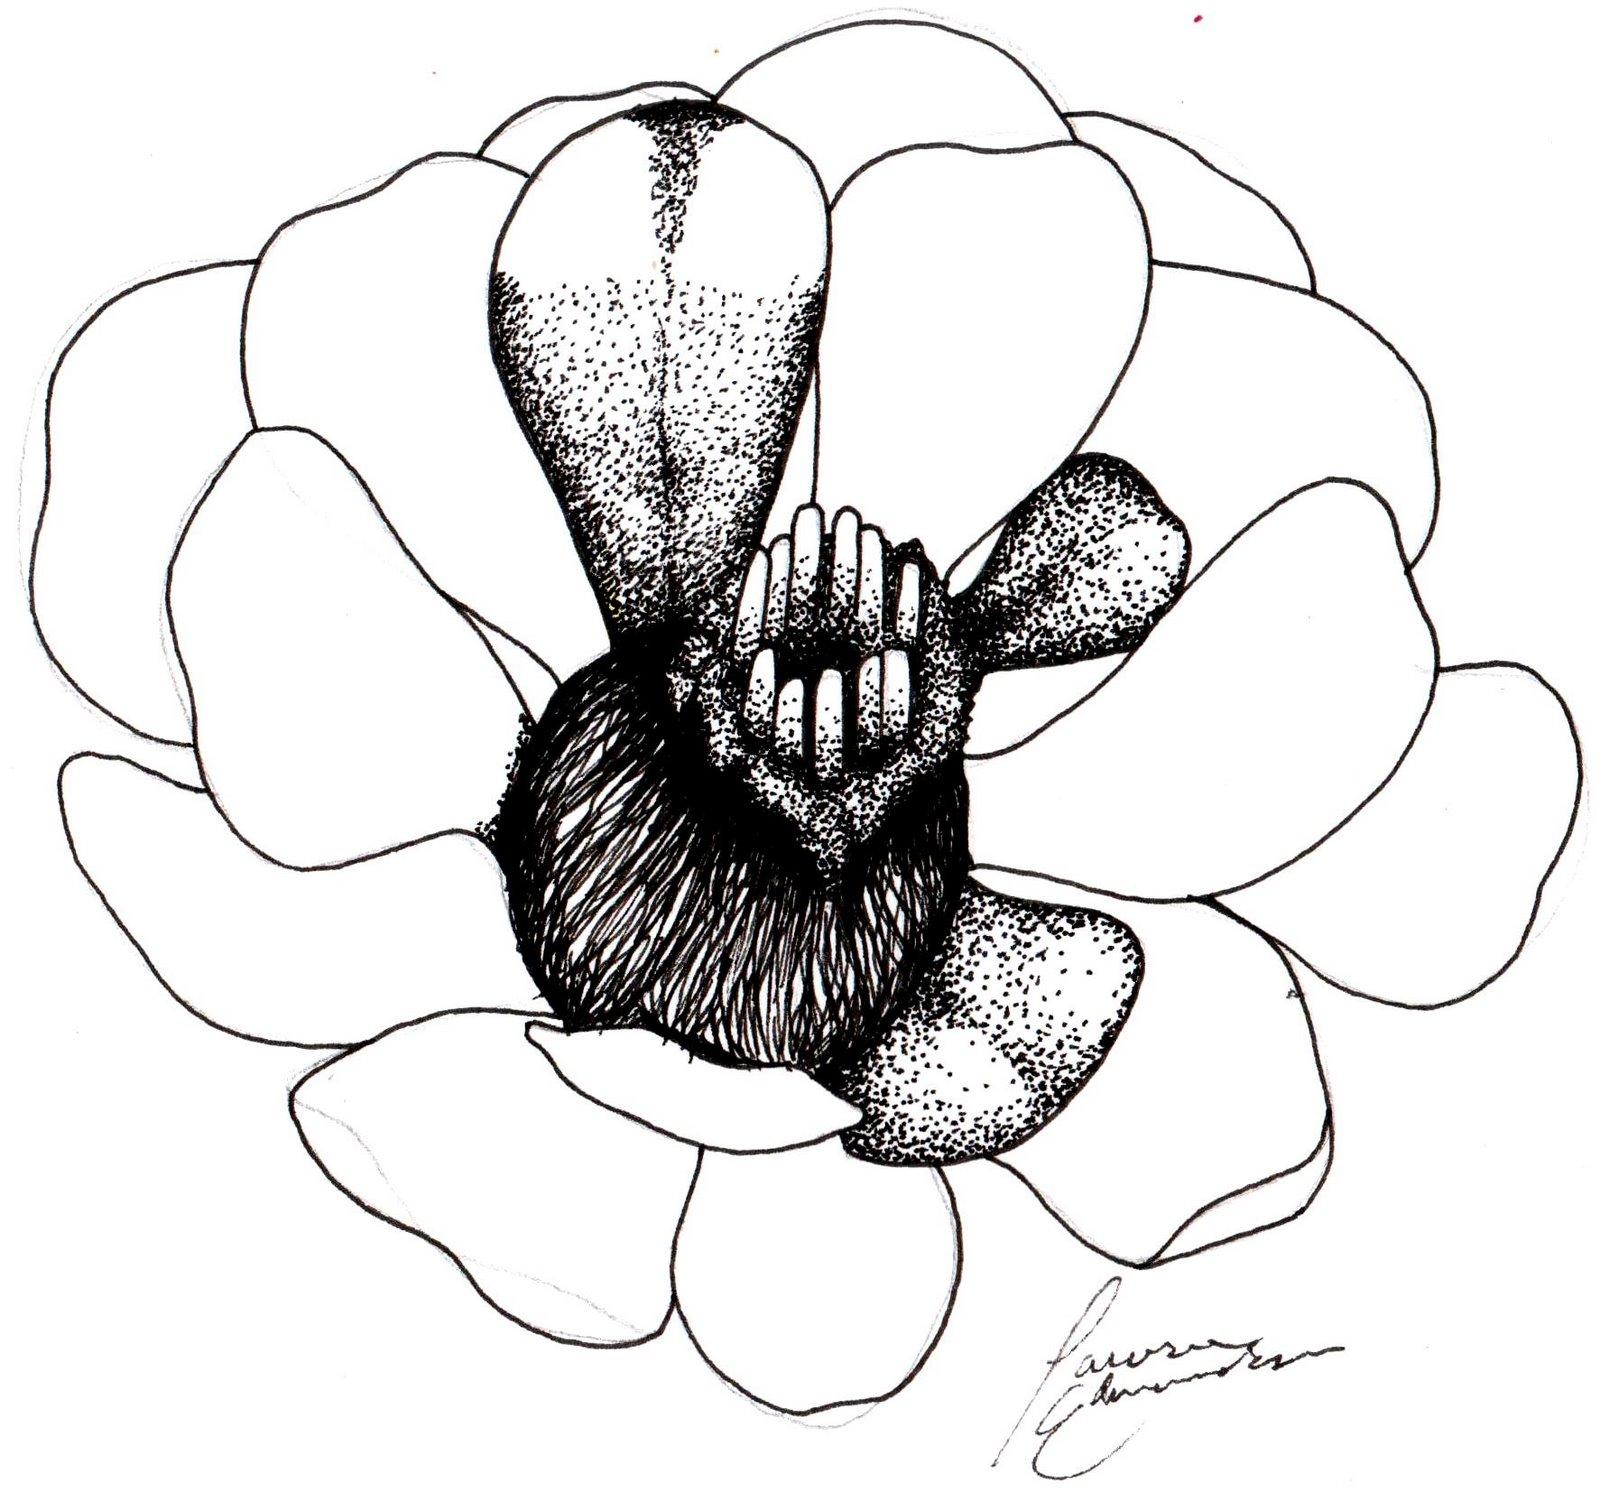 Cactus Flower Drawing - ClipArt Best  Cactus Flower Outline